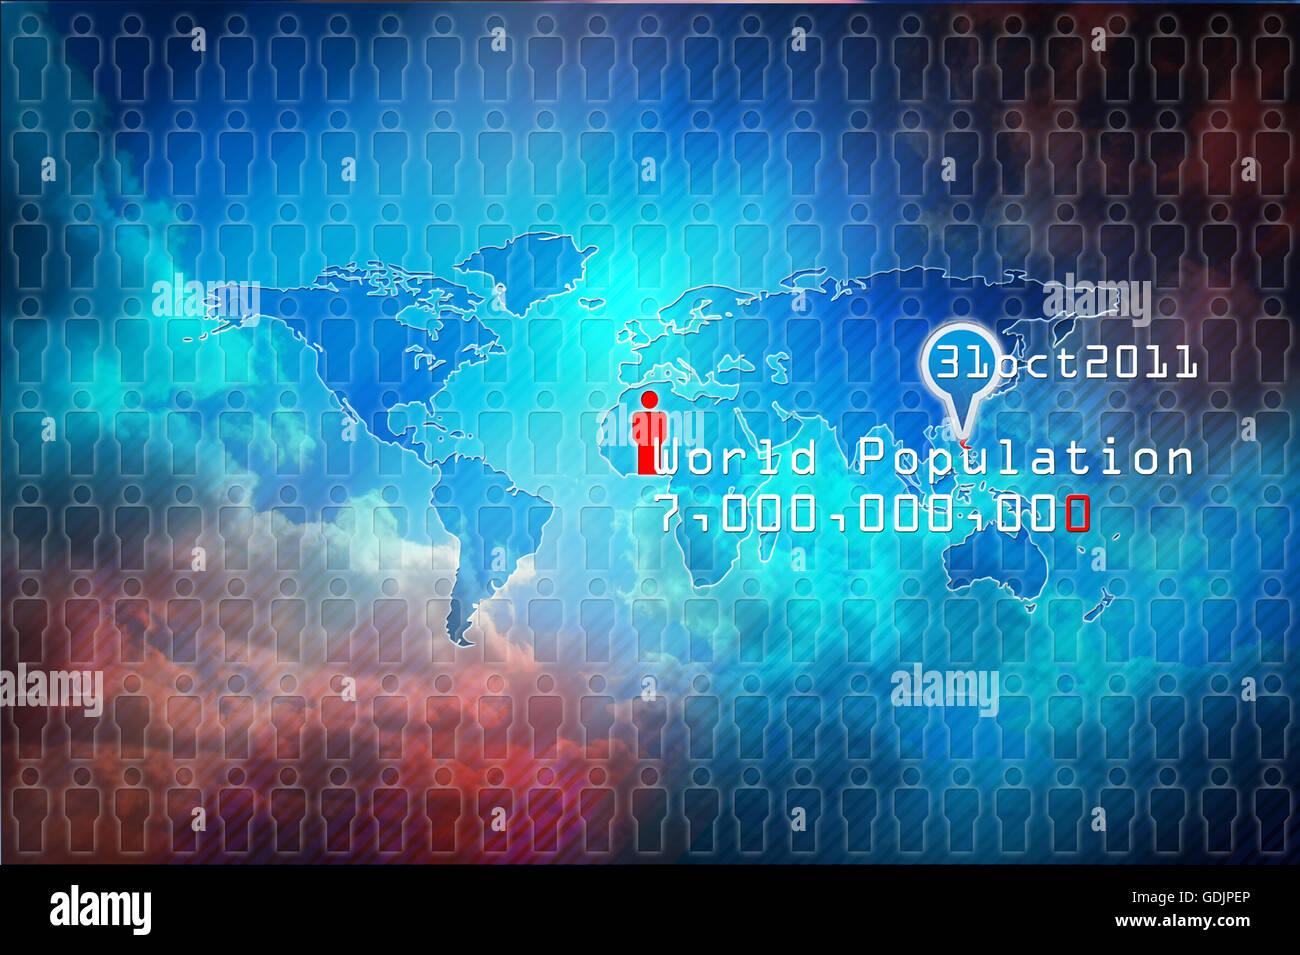 World population, global map population - Stock Image